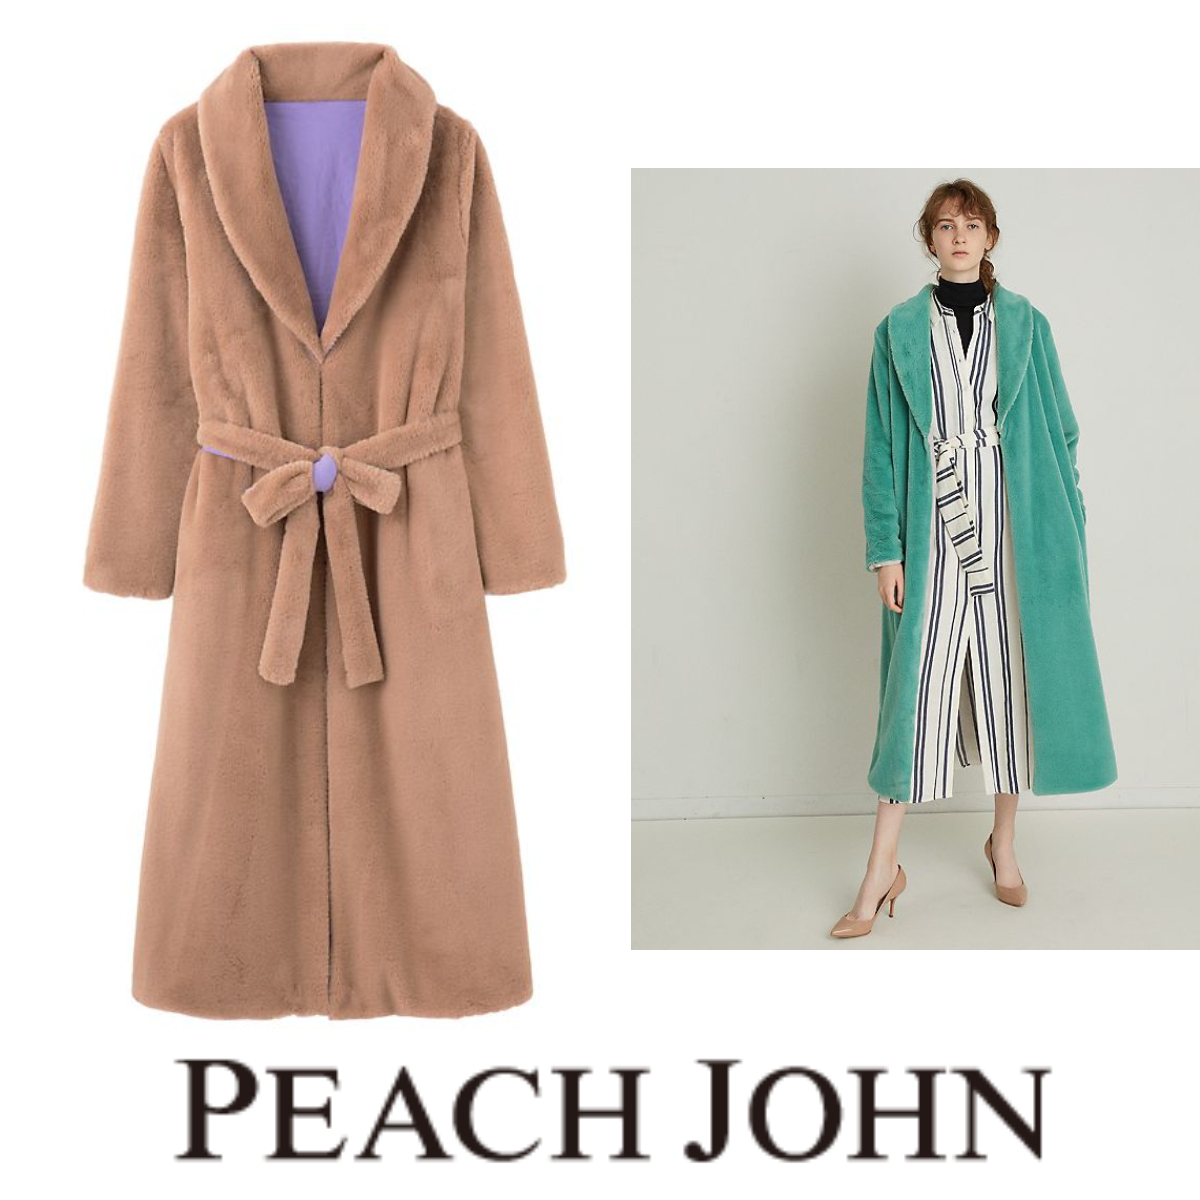 Peach John*Keiko Sasaki × SALON*Reversible Eco Fur Coat Gown